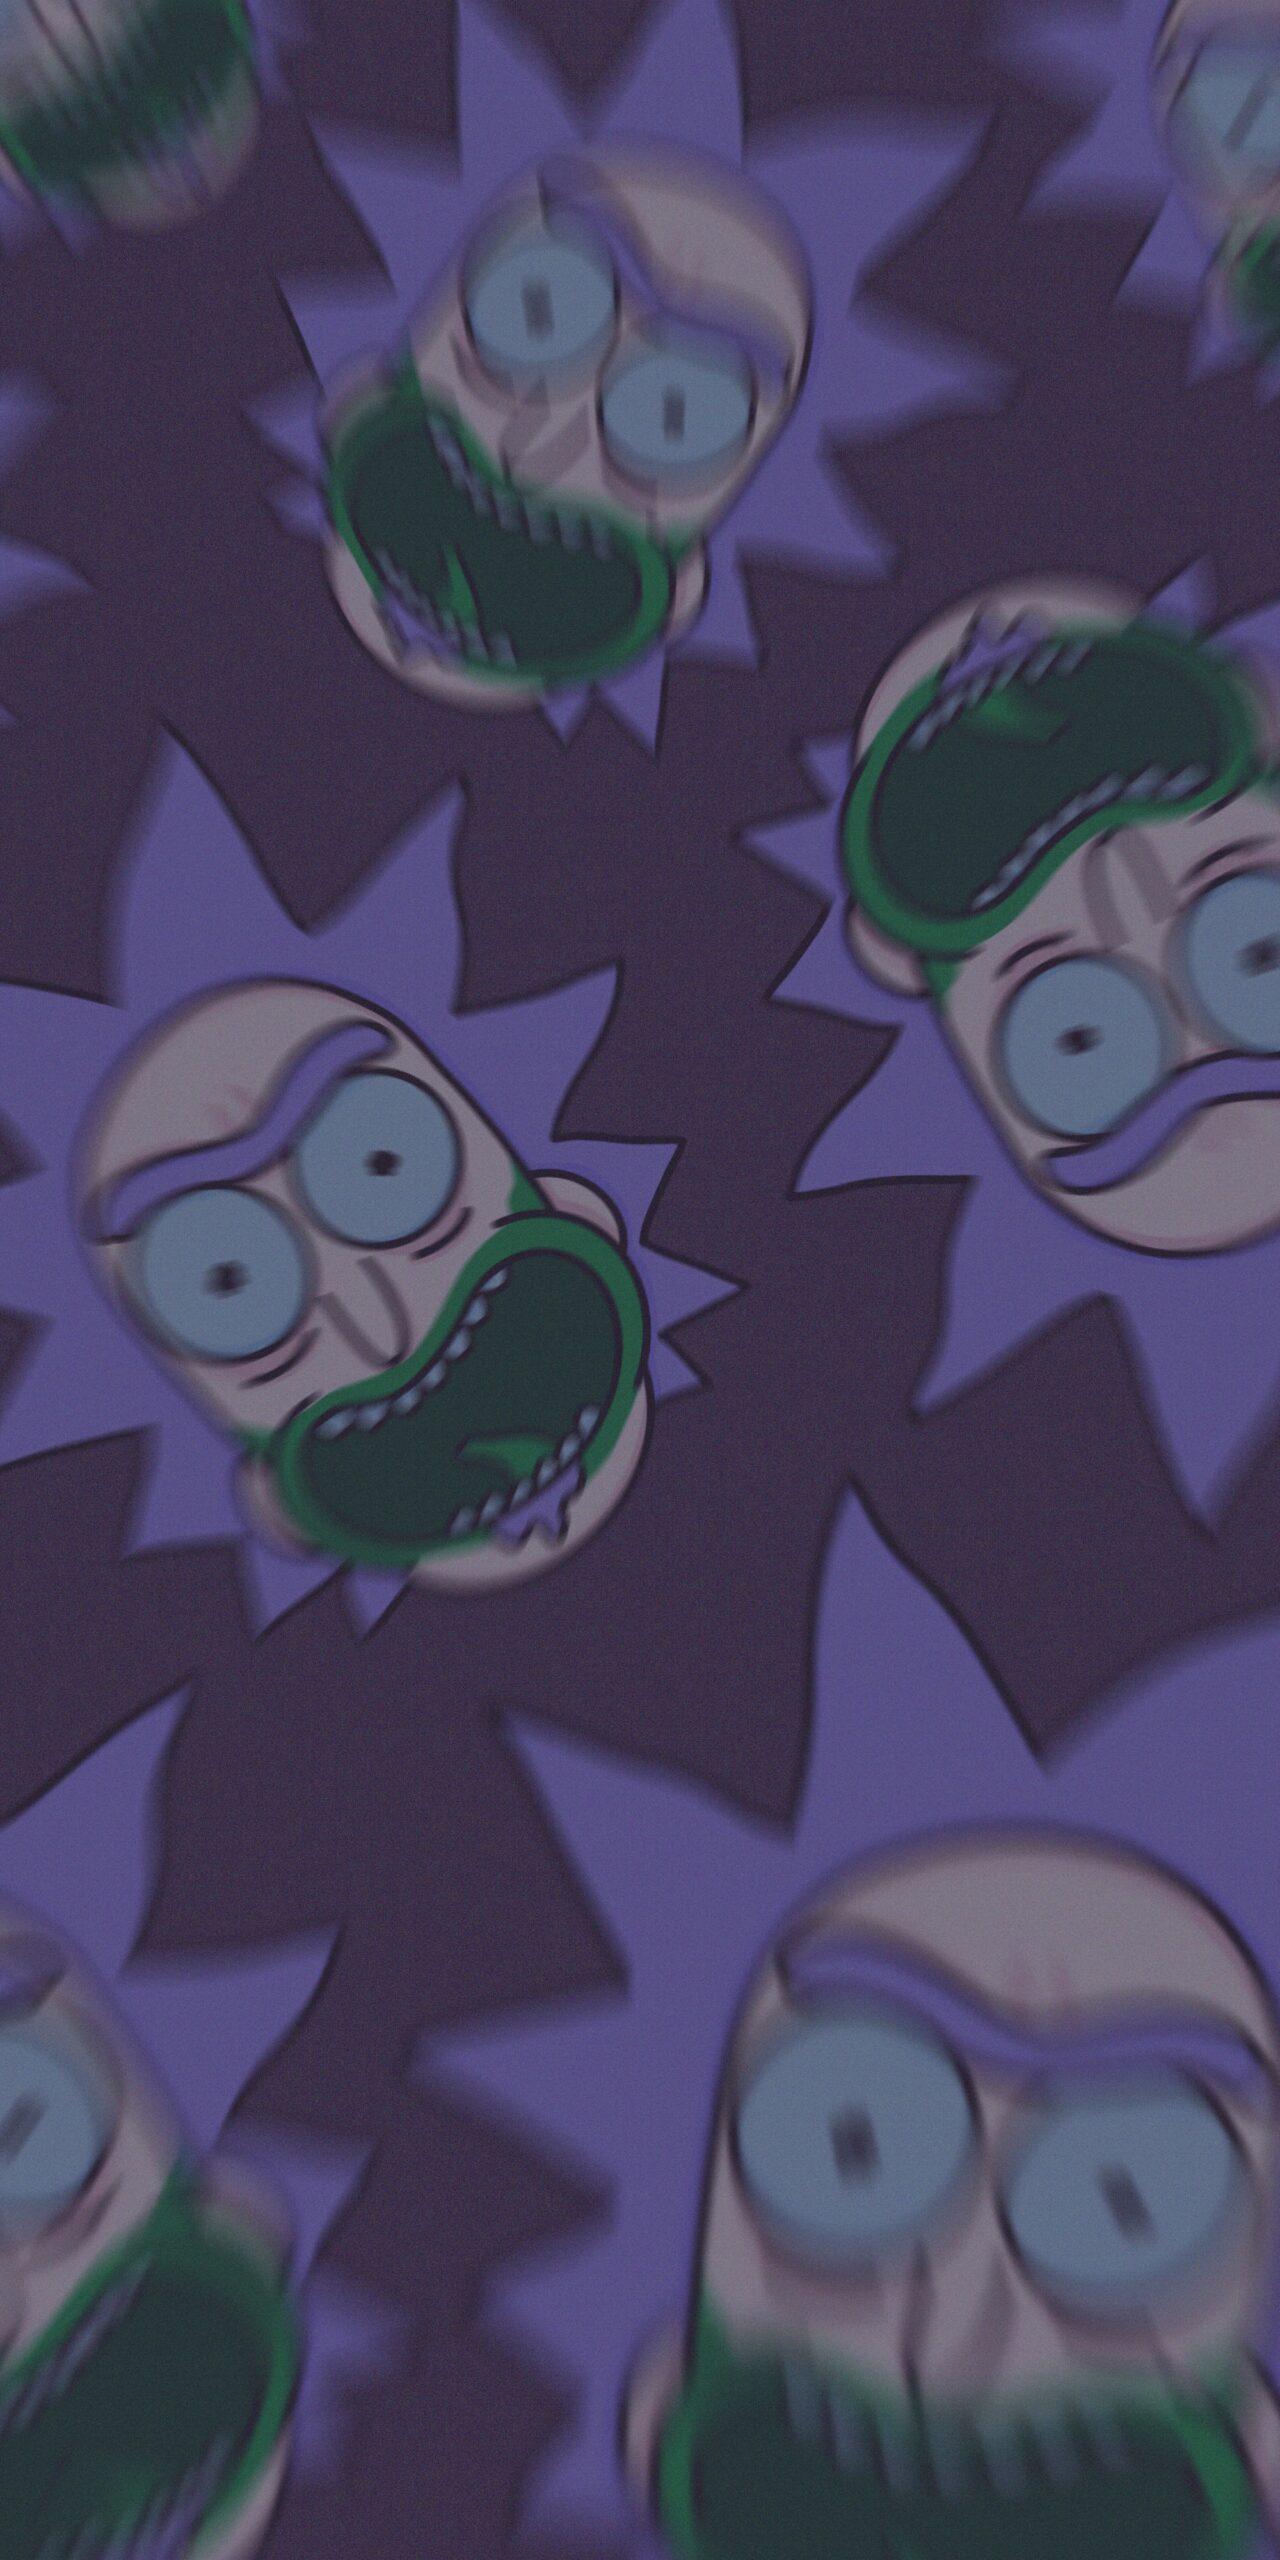 rick and morty rick sanchez joker purple background wallpaper